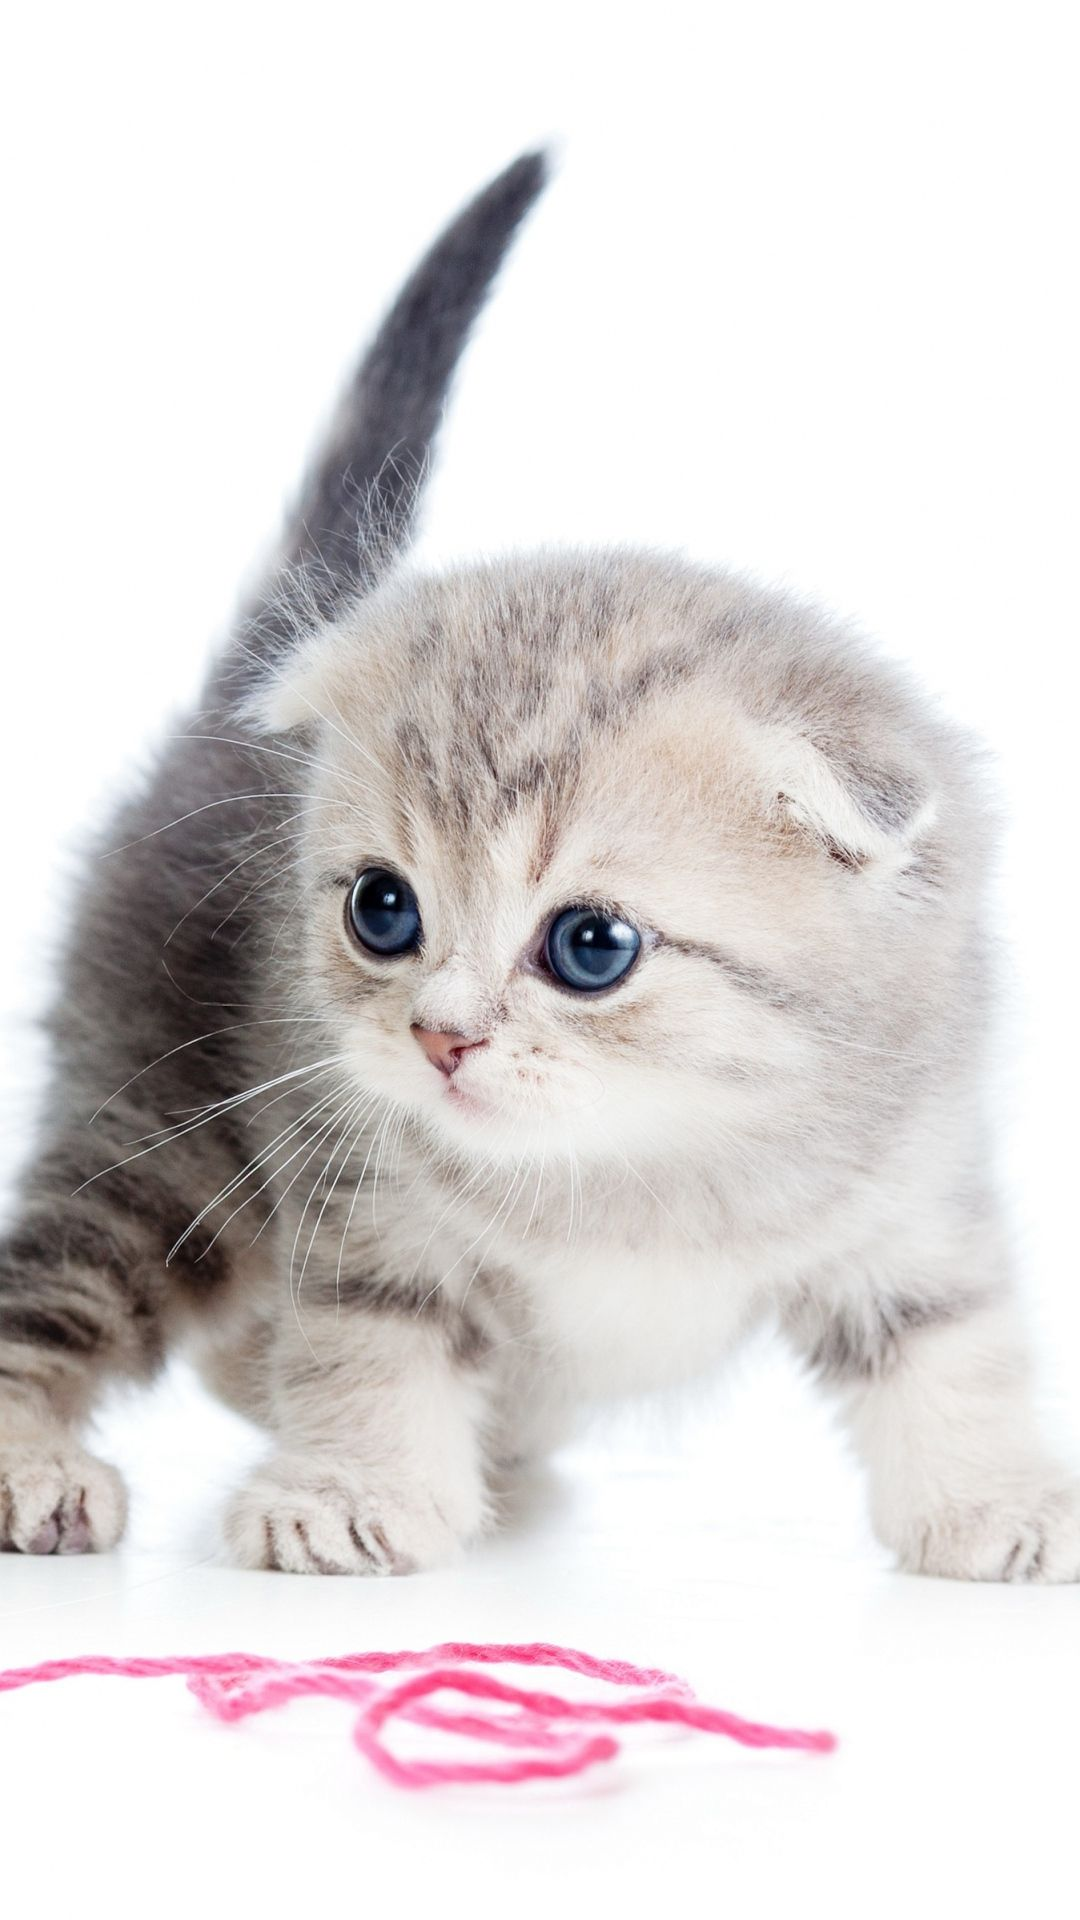 Kitten Ball Thread White Background iPhone 6 plus